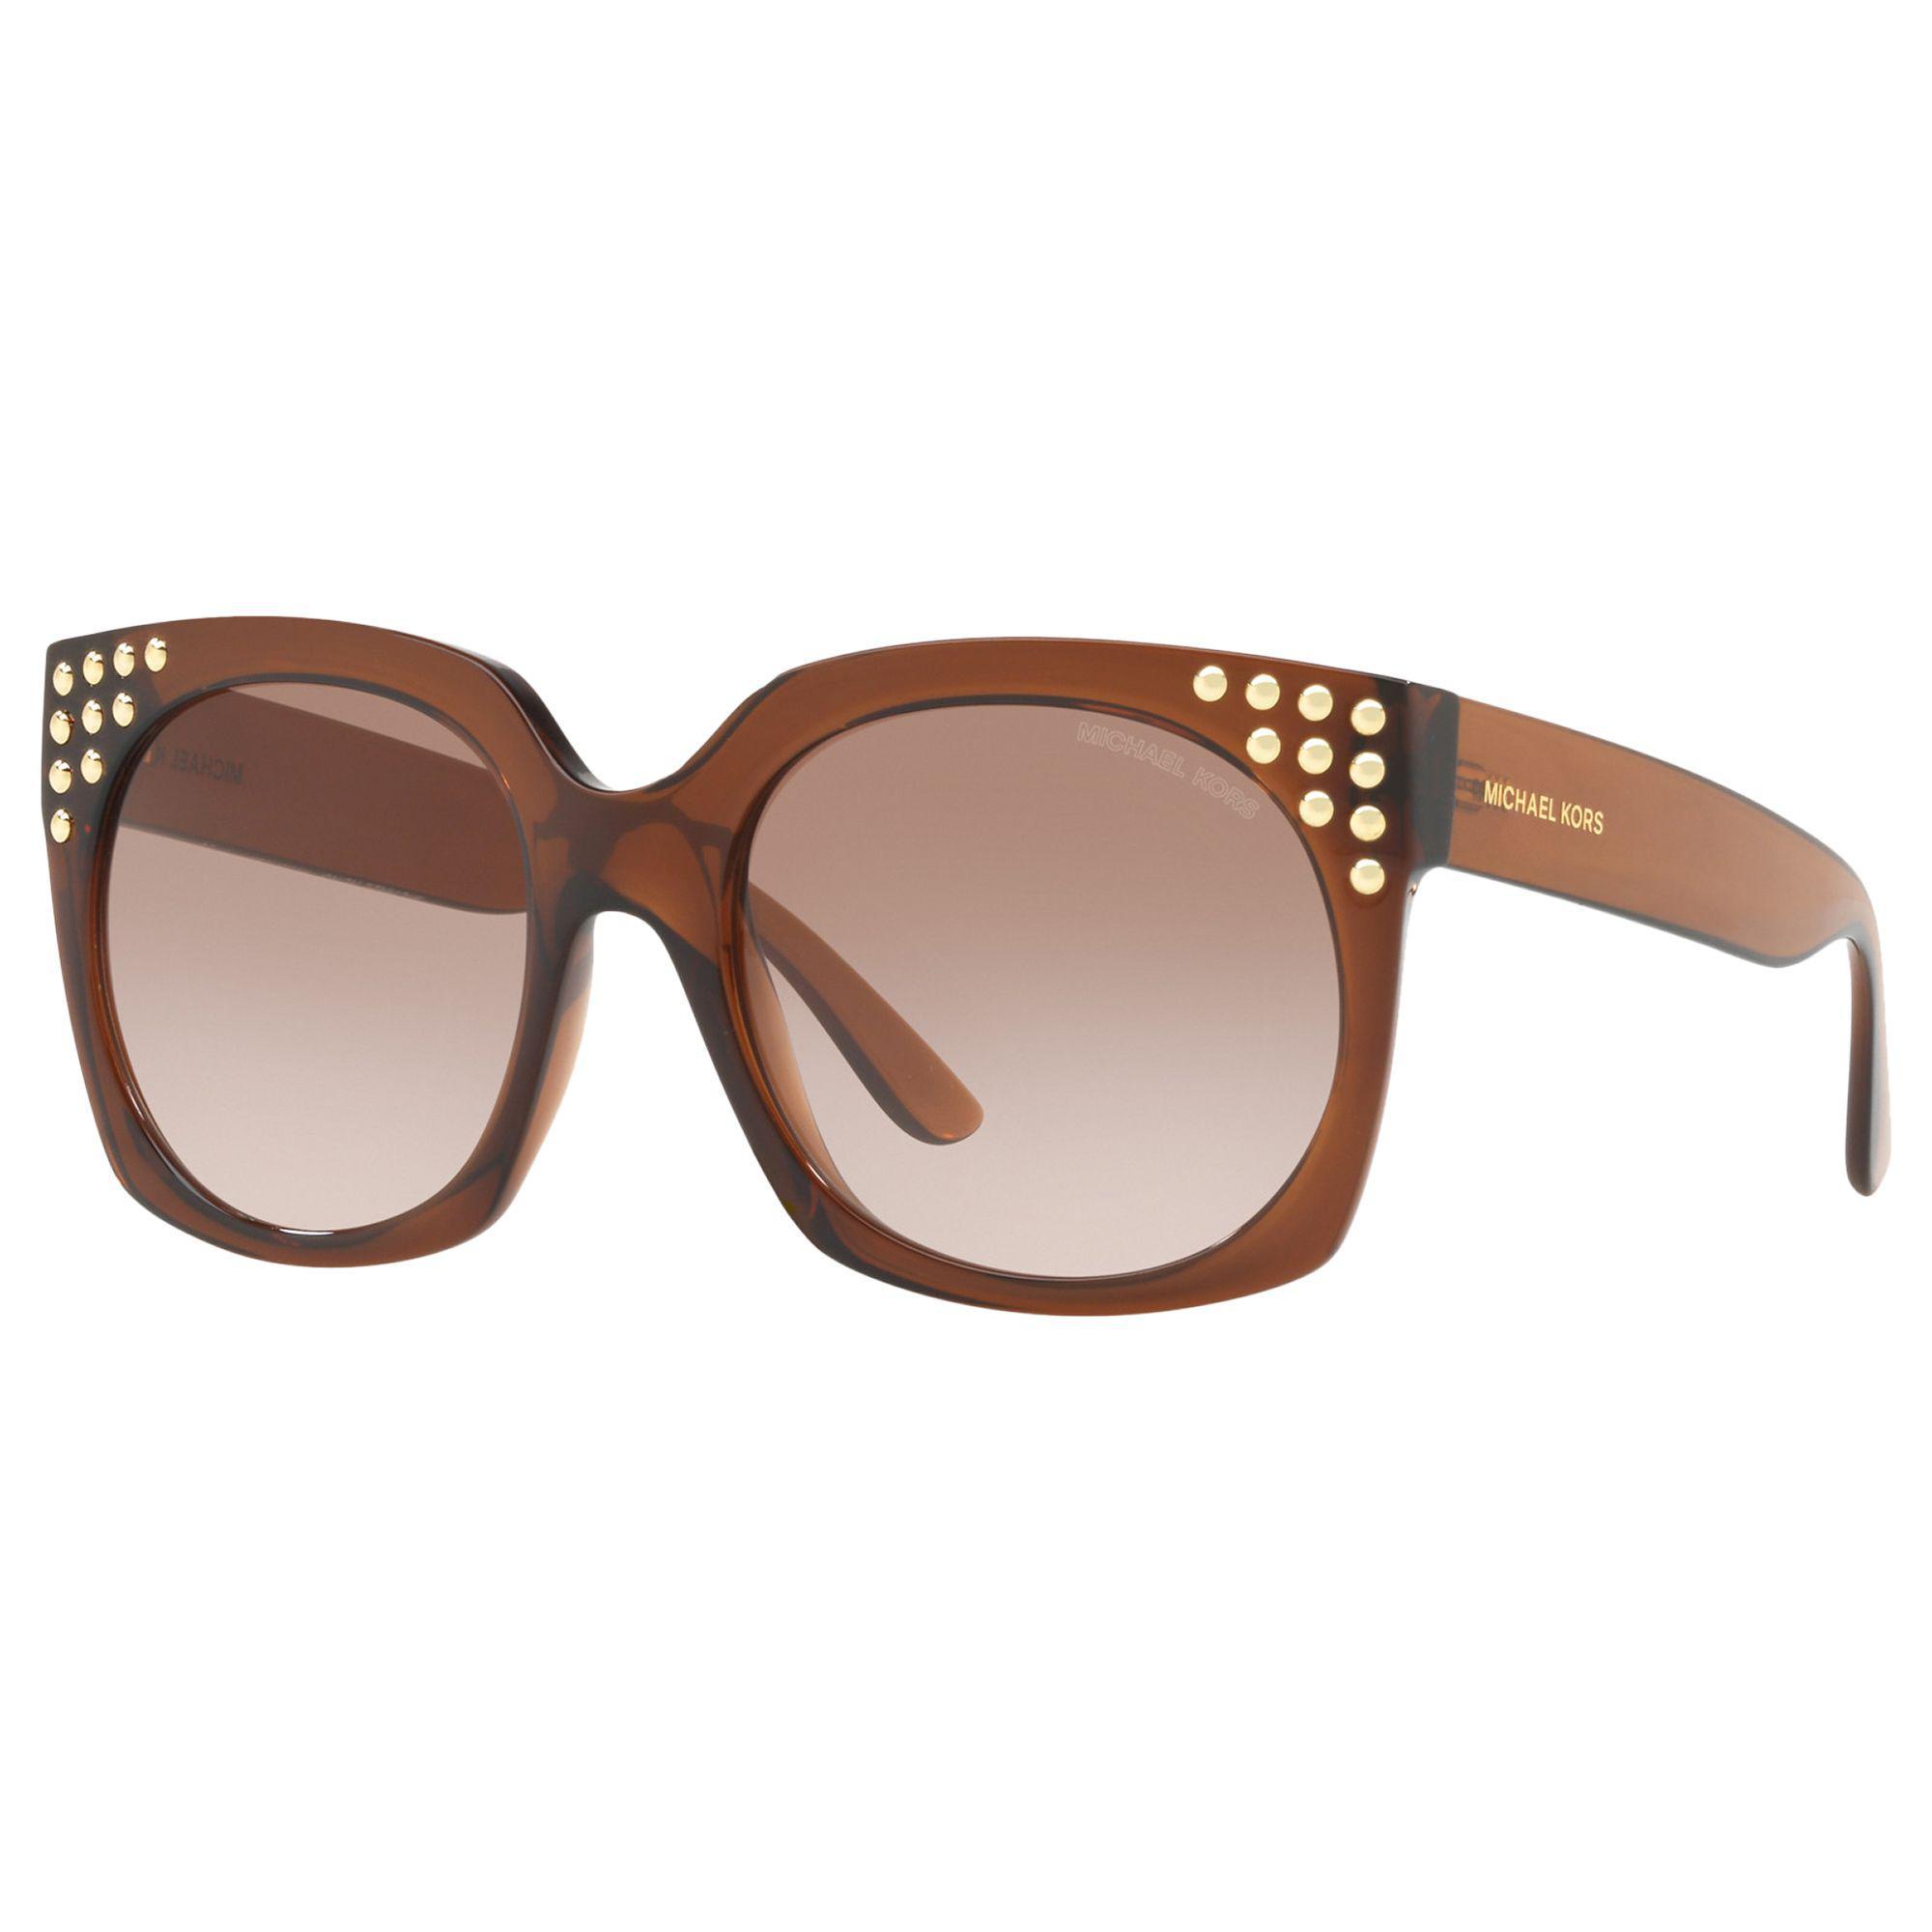 237bb78b63d8c Michael Kors Mk2067 Women s Destin Studded Square Sunglasses in ...